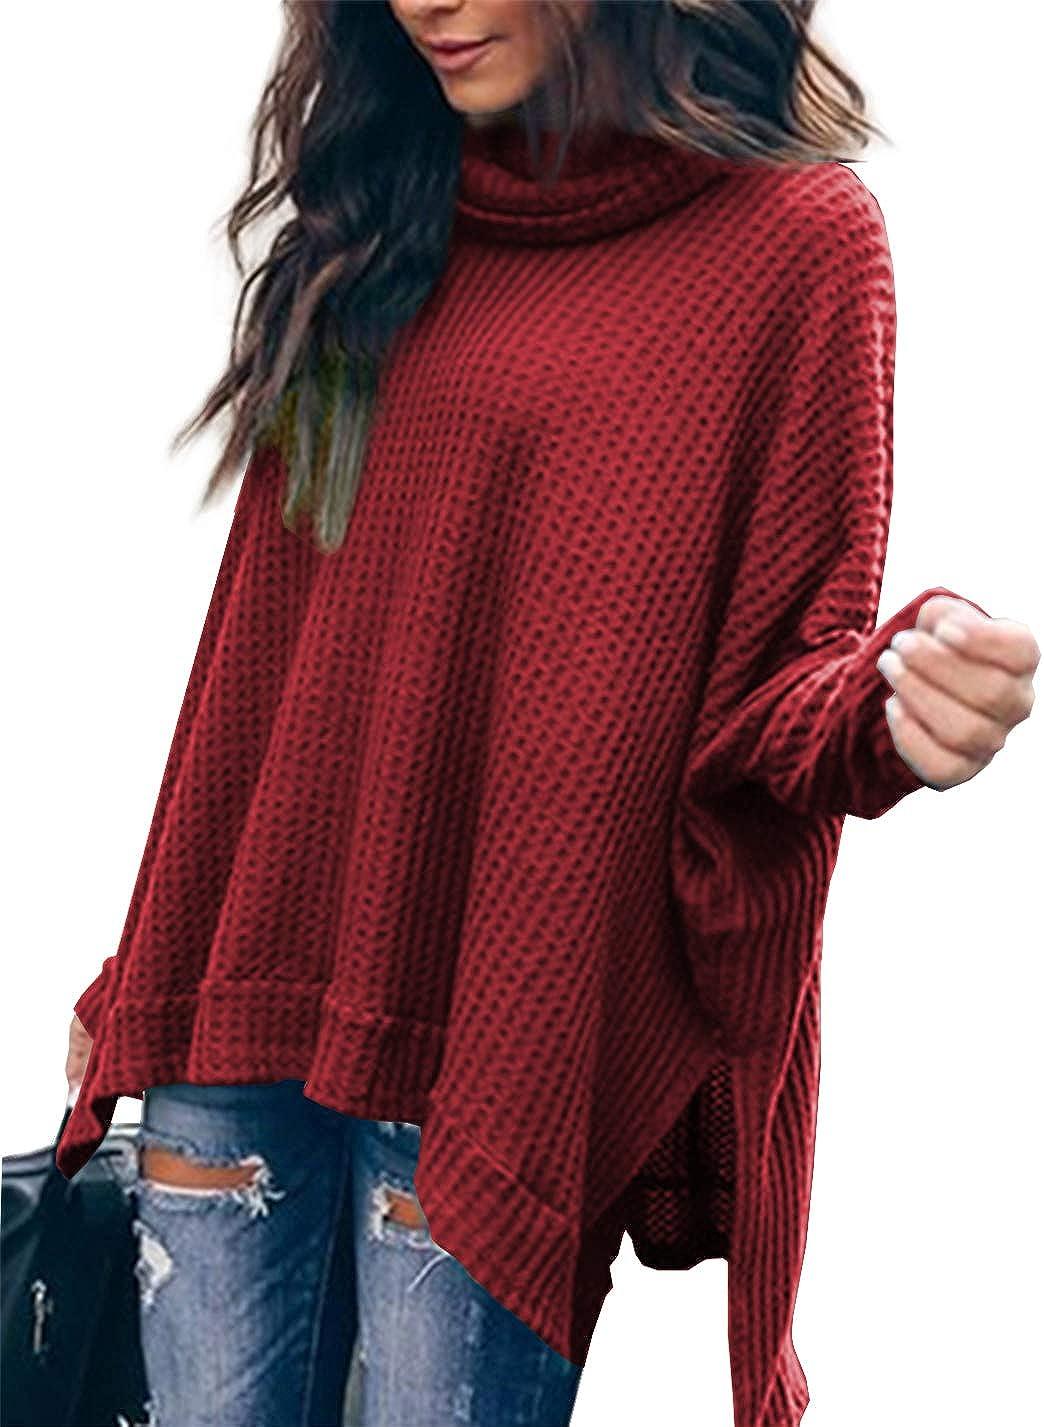 Albe Rita Women Casual Turtlenck Batwing Sleeve High Low Hem Side Slit Waffle Knit Loose Oversized Sweater Tunic Tops